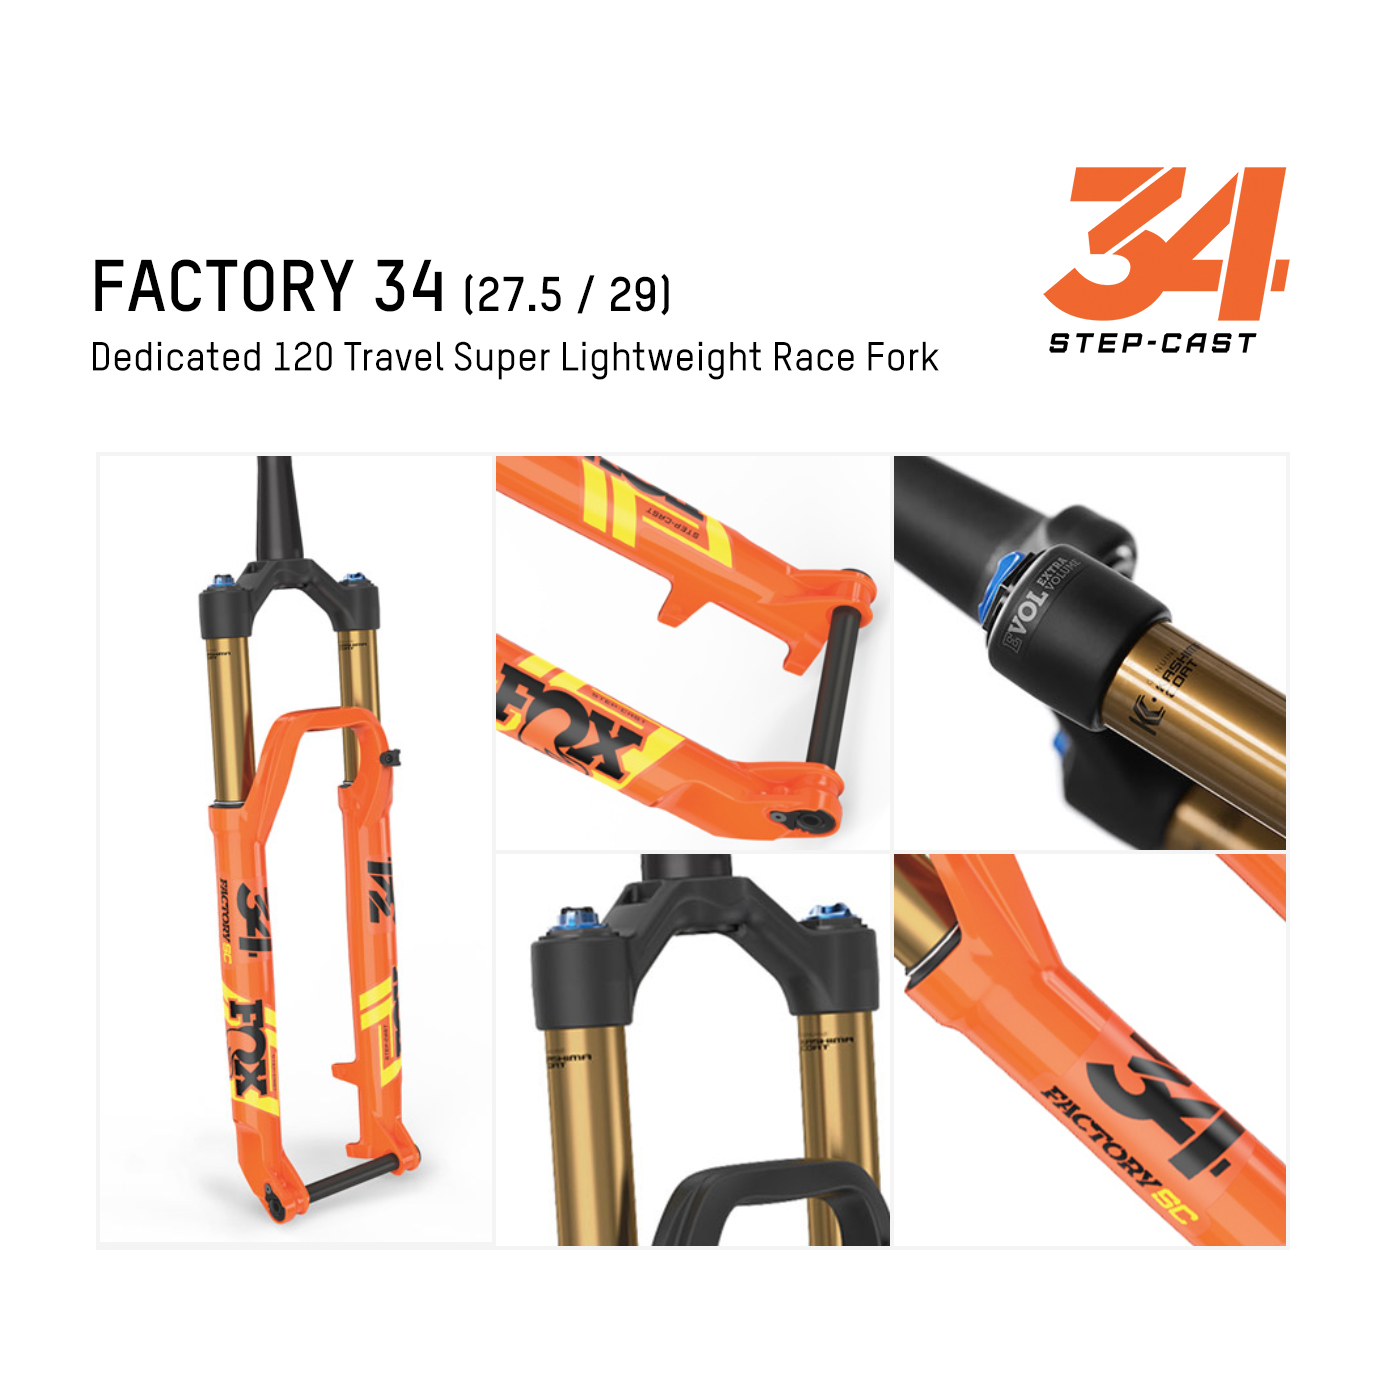 Fox รุ่น Factory 34 SC (Lightweight Trail)